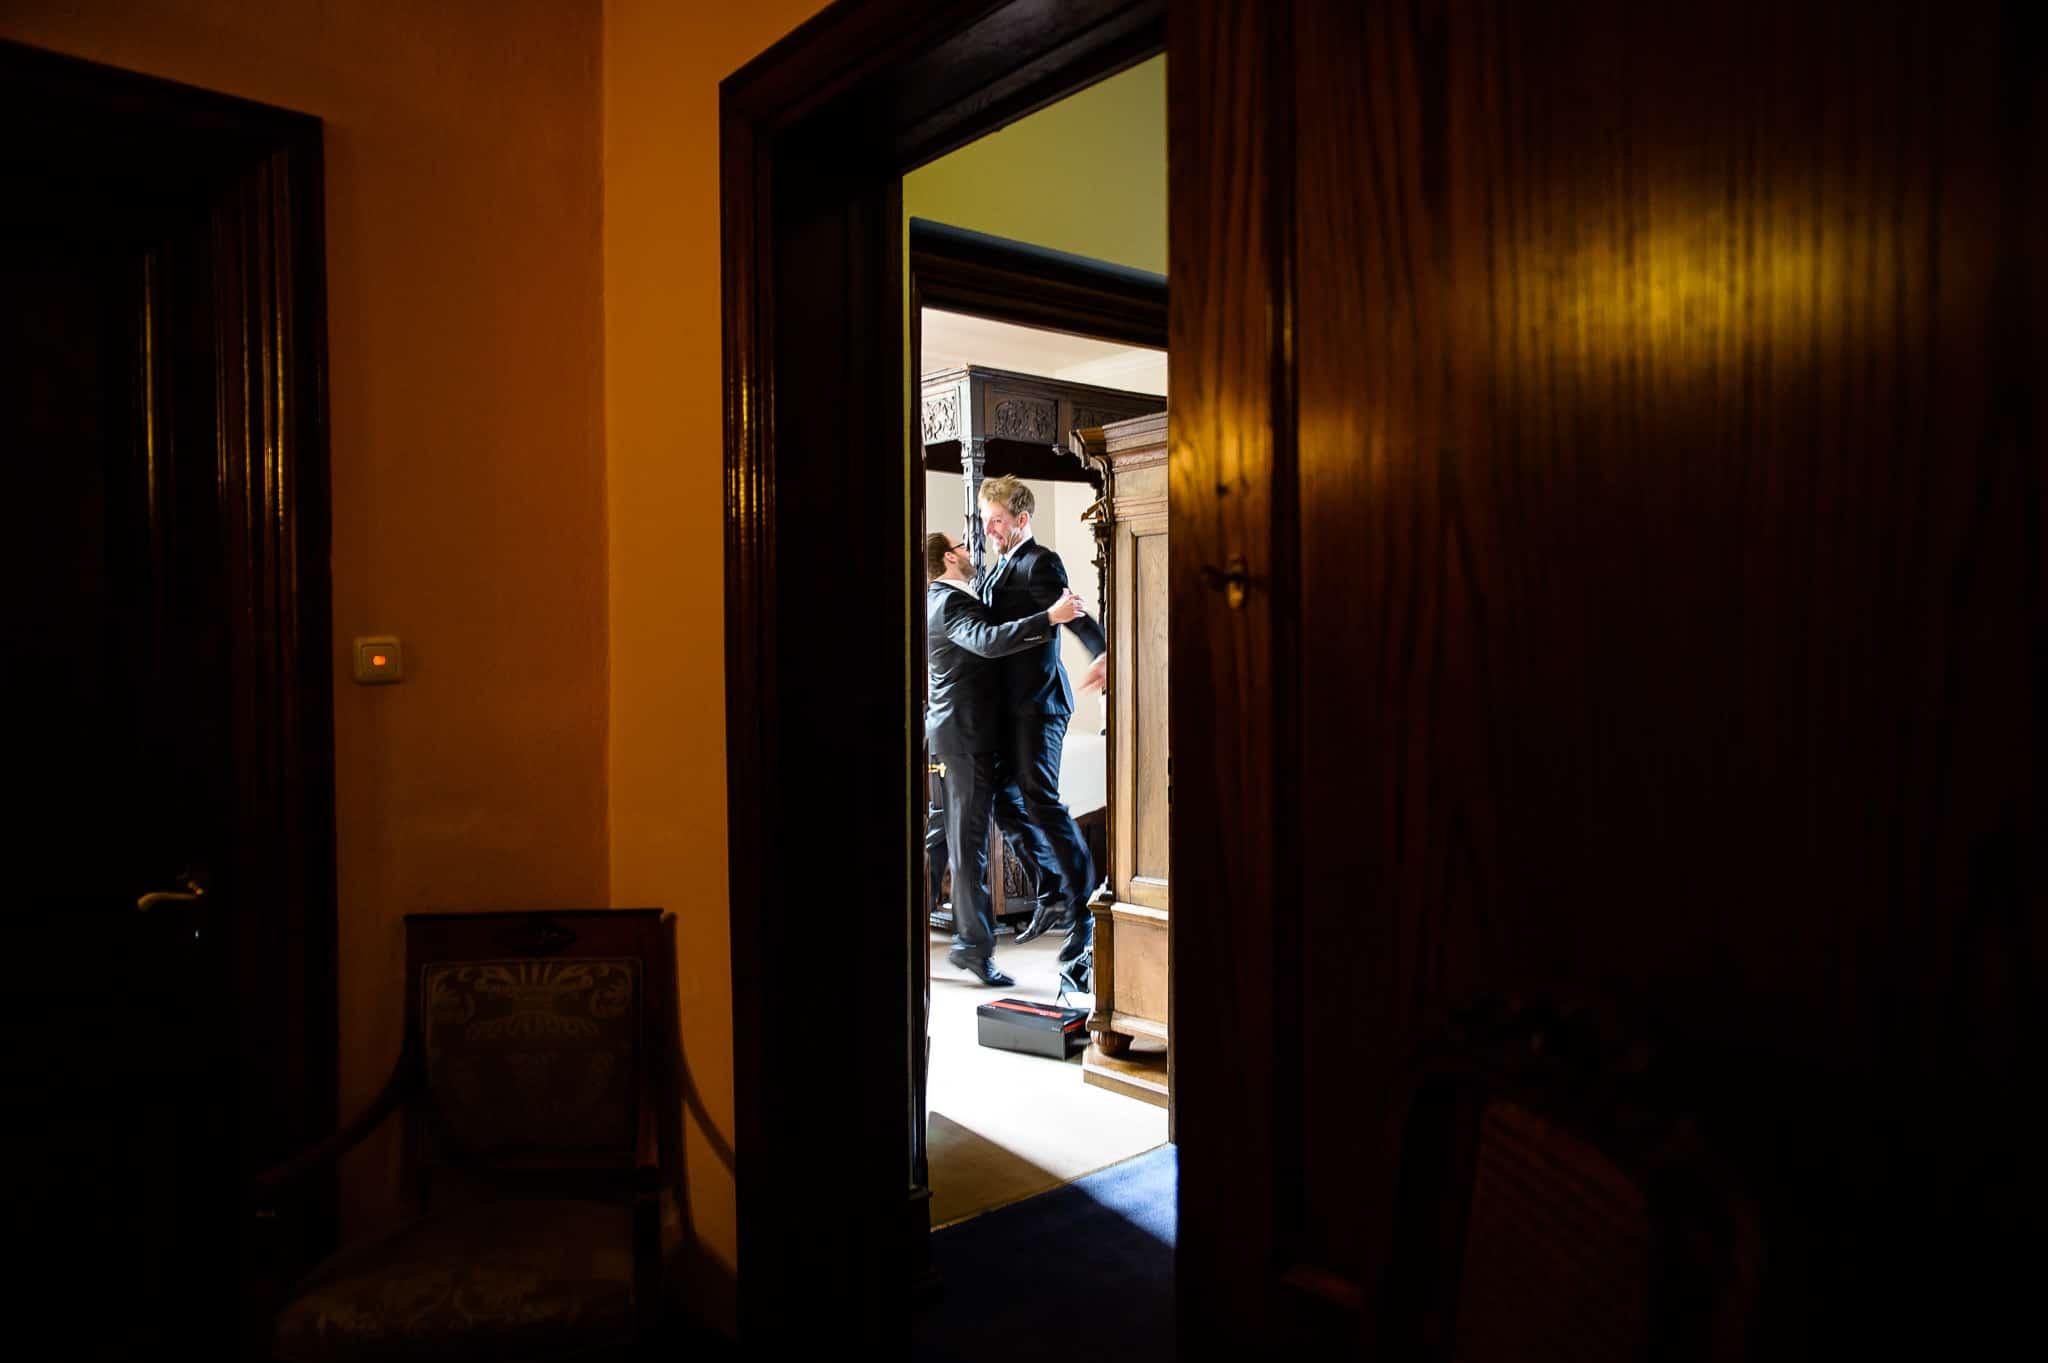 Freie Trauung Schlosshotel Hugenpoet